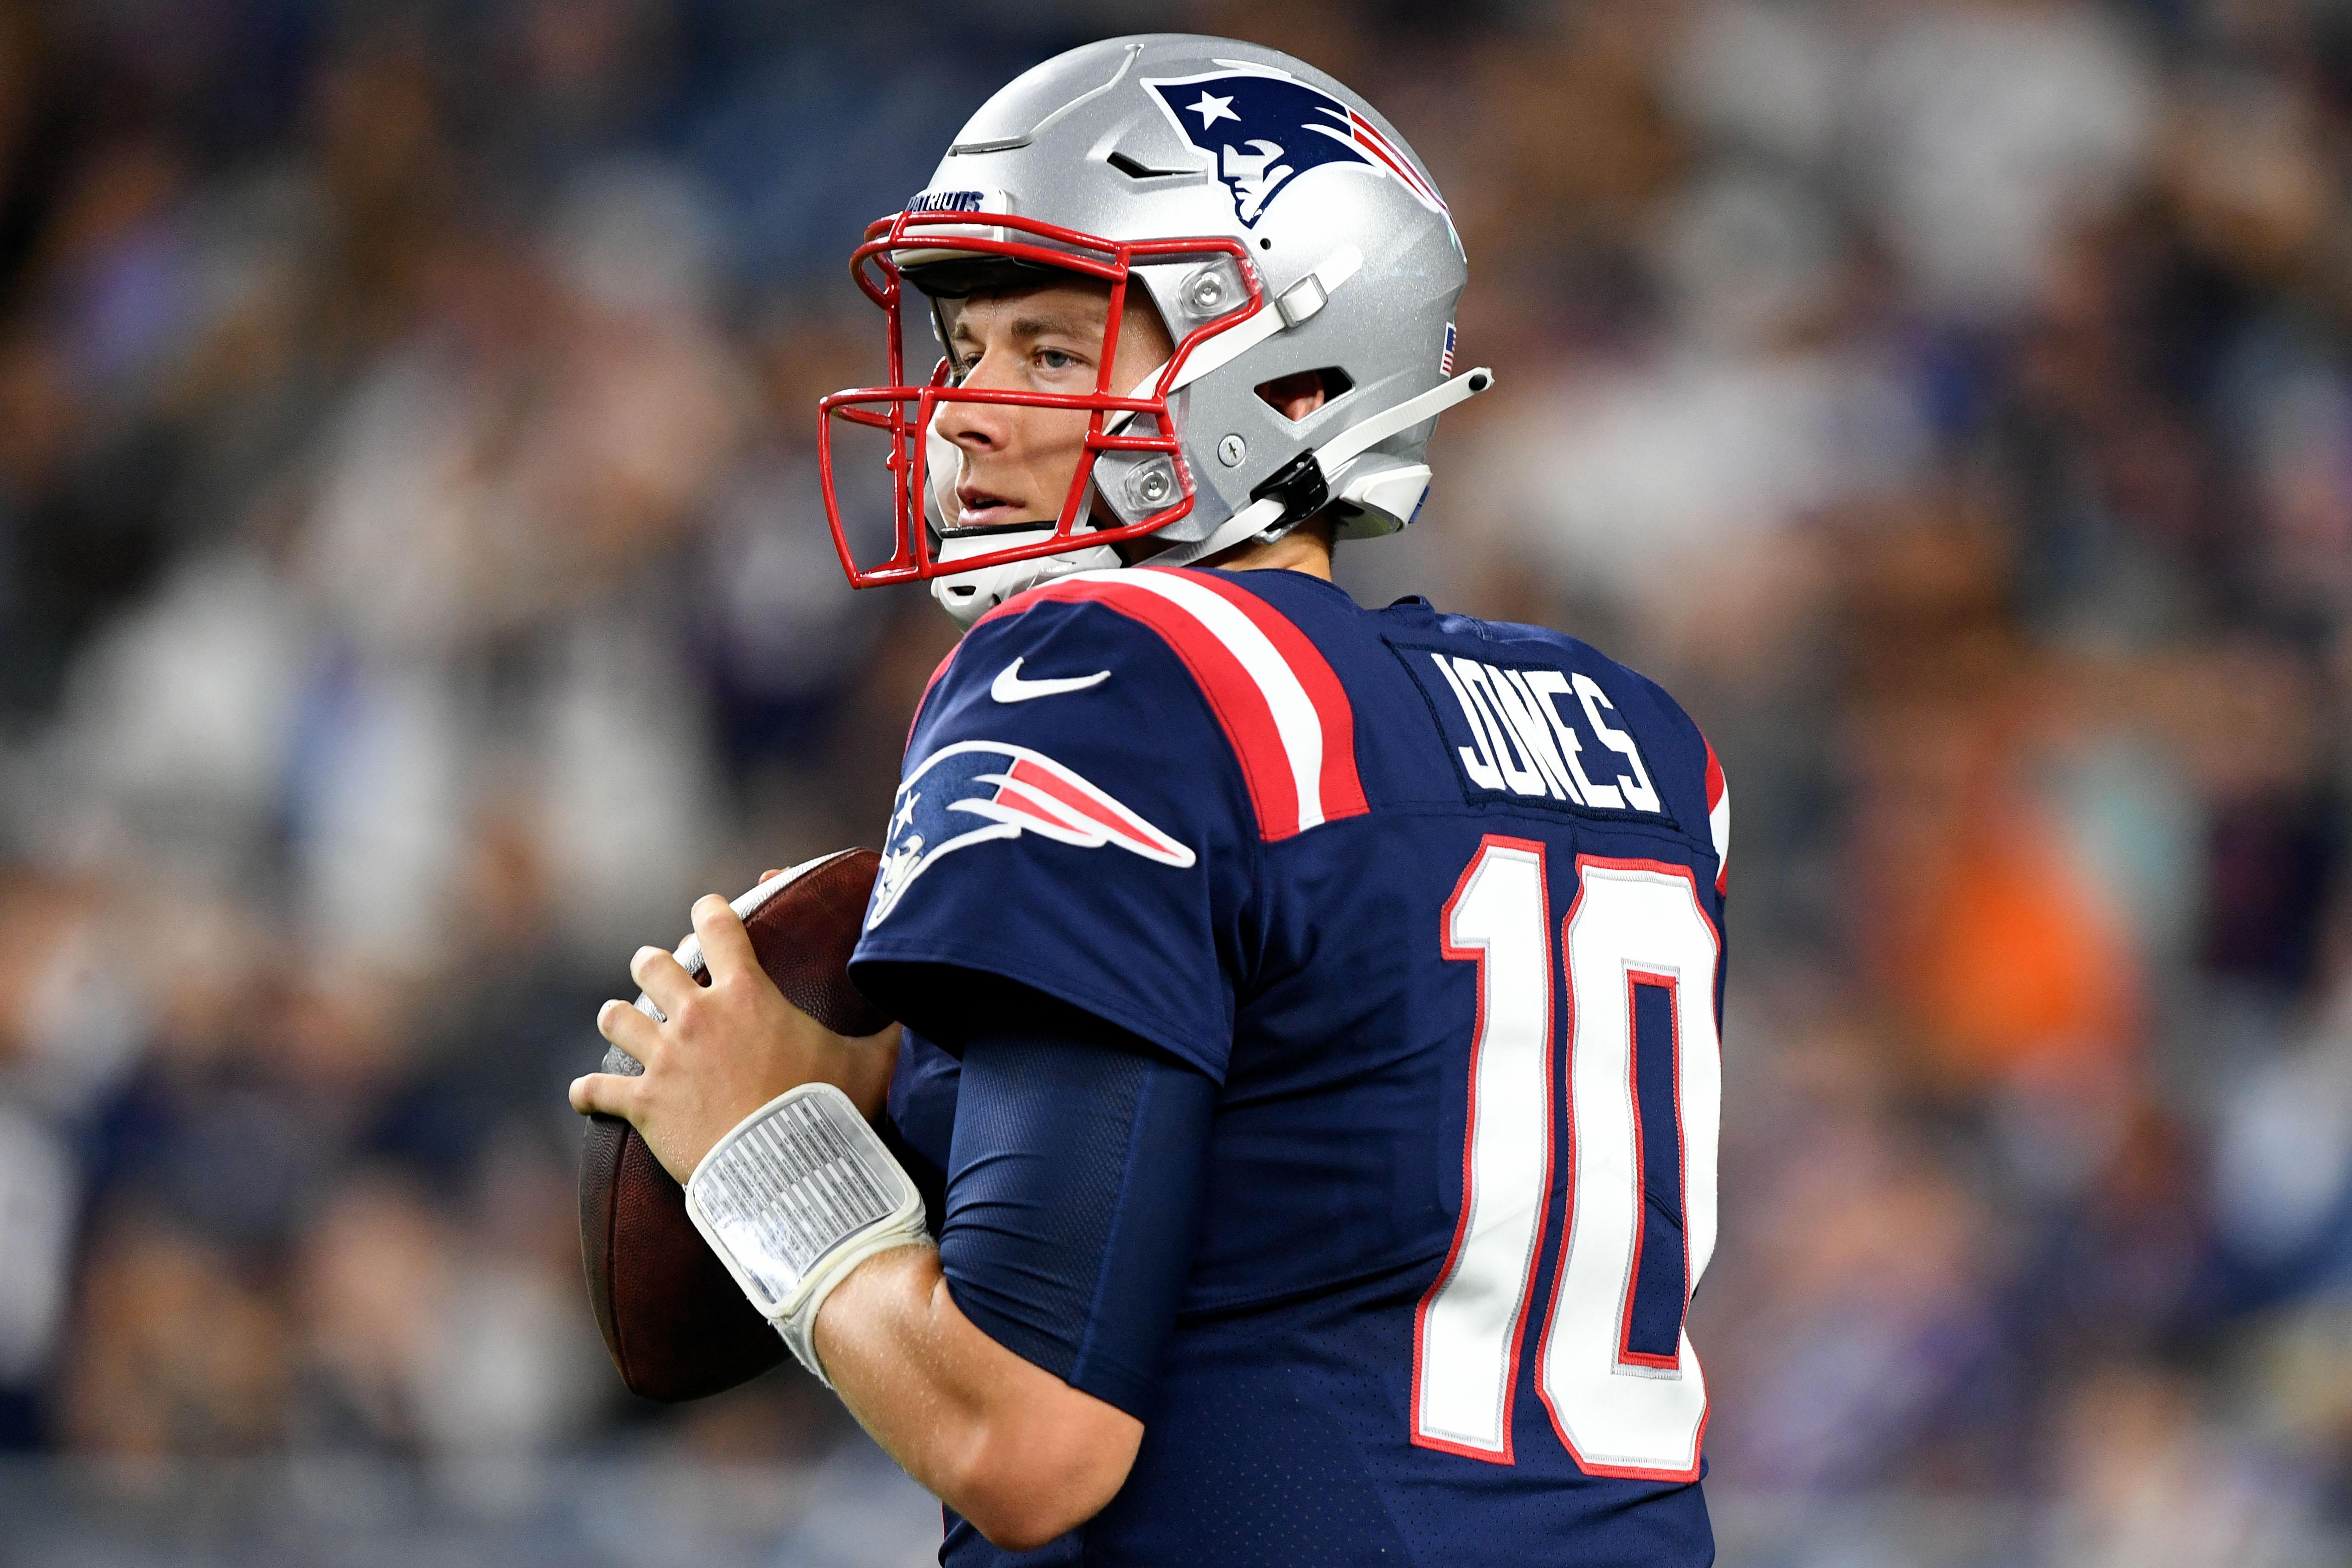 NFL: Washington Football Team at New England Patriots